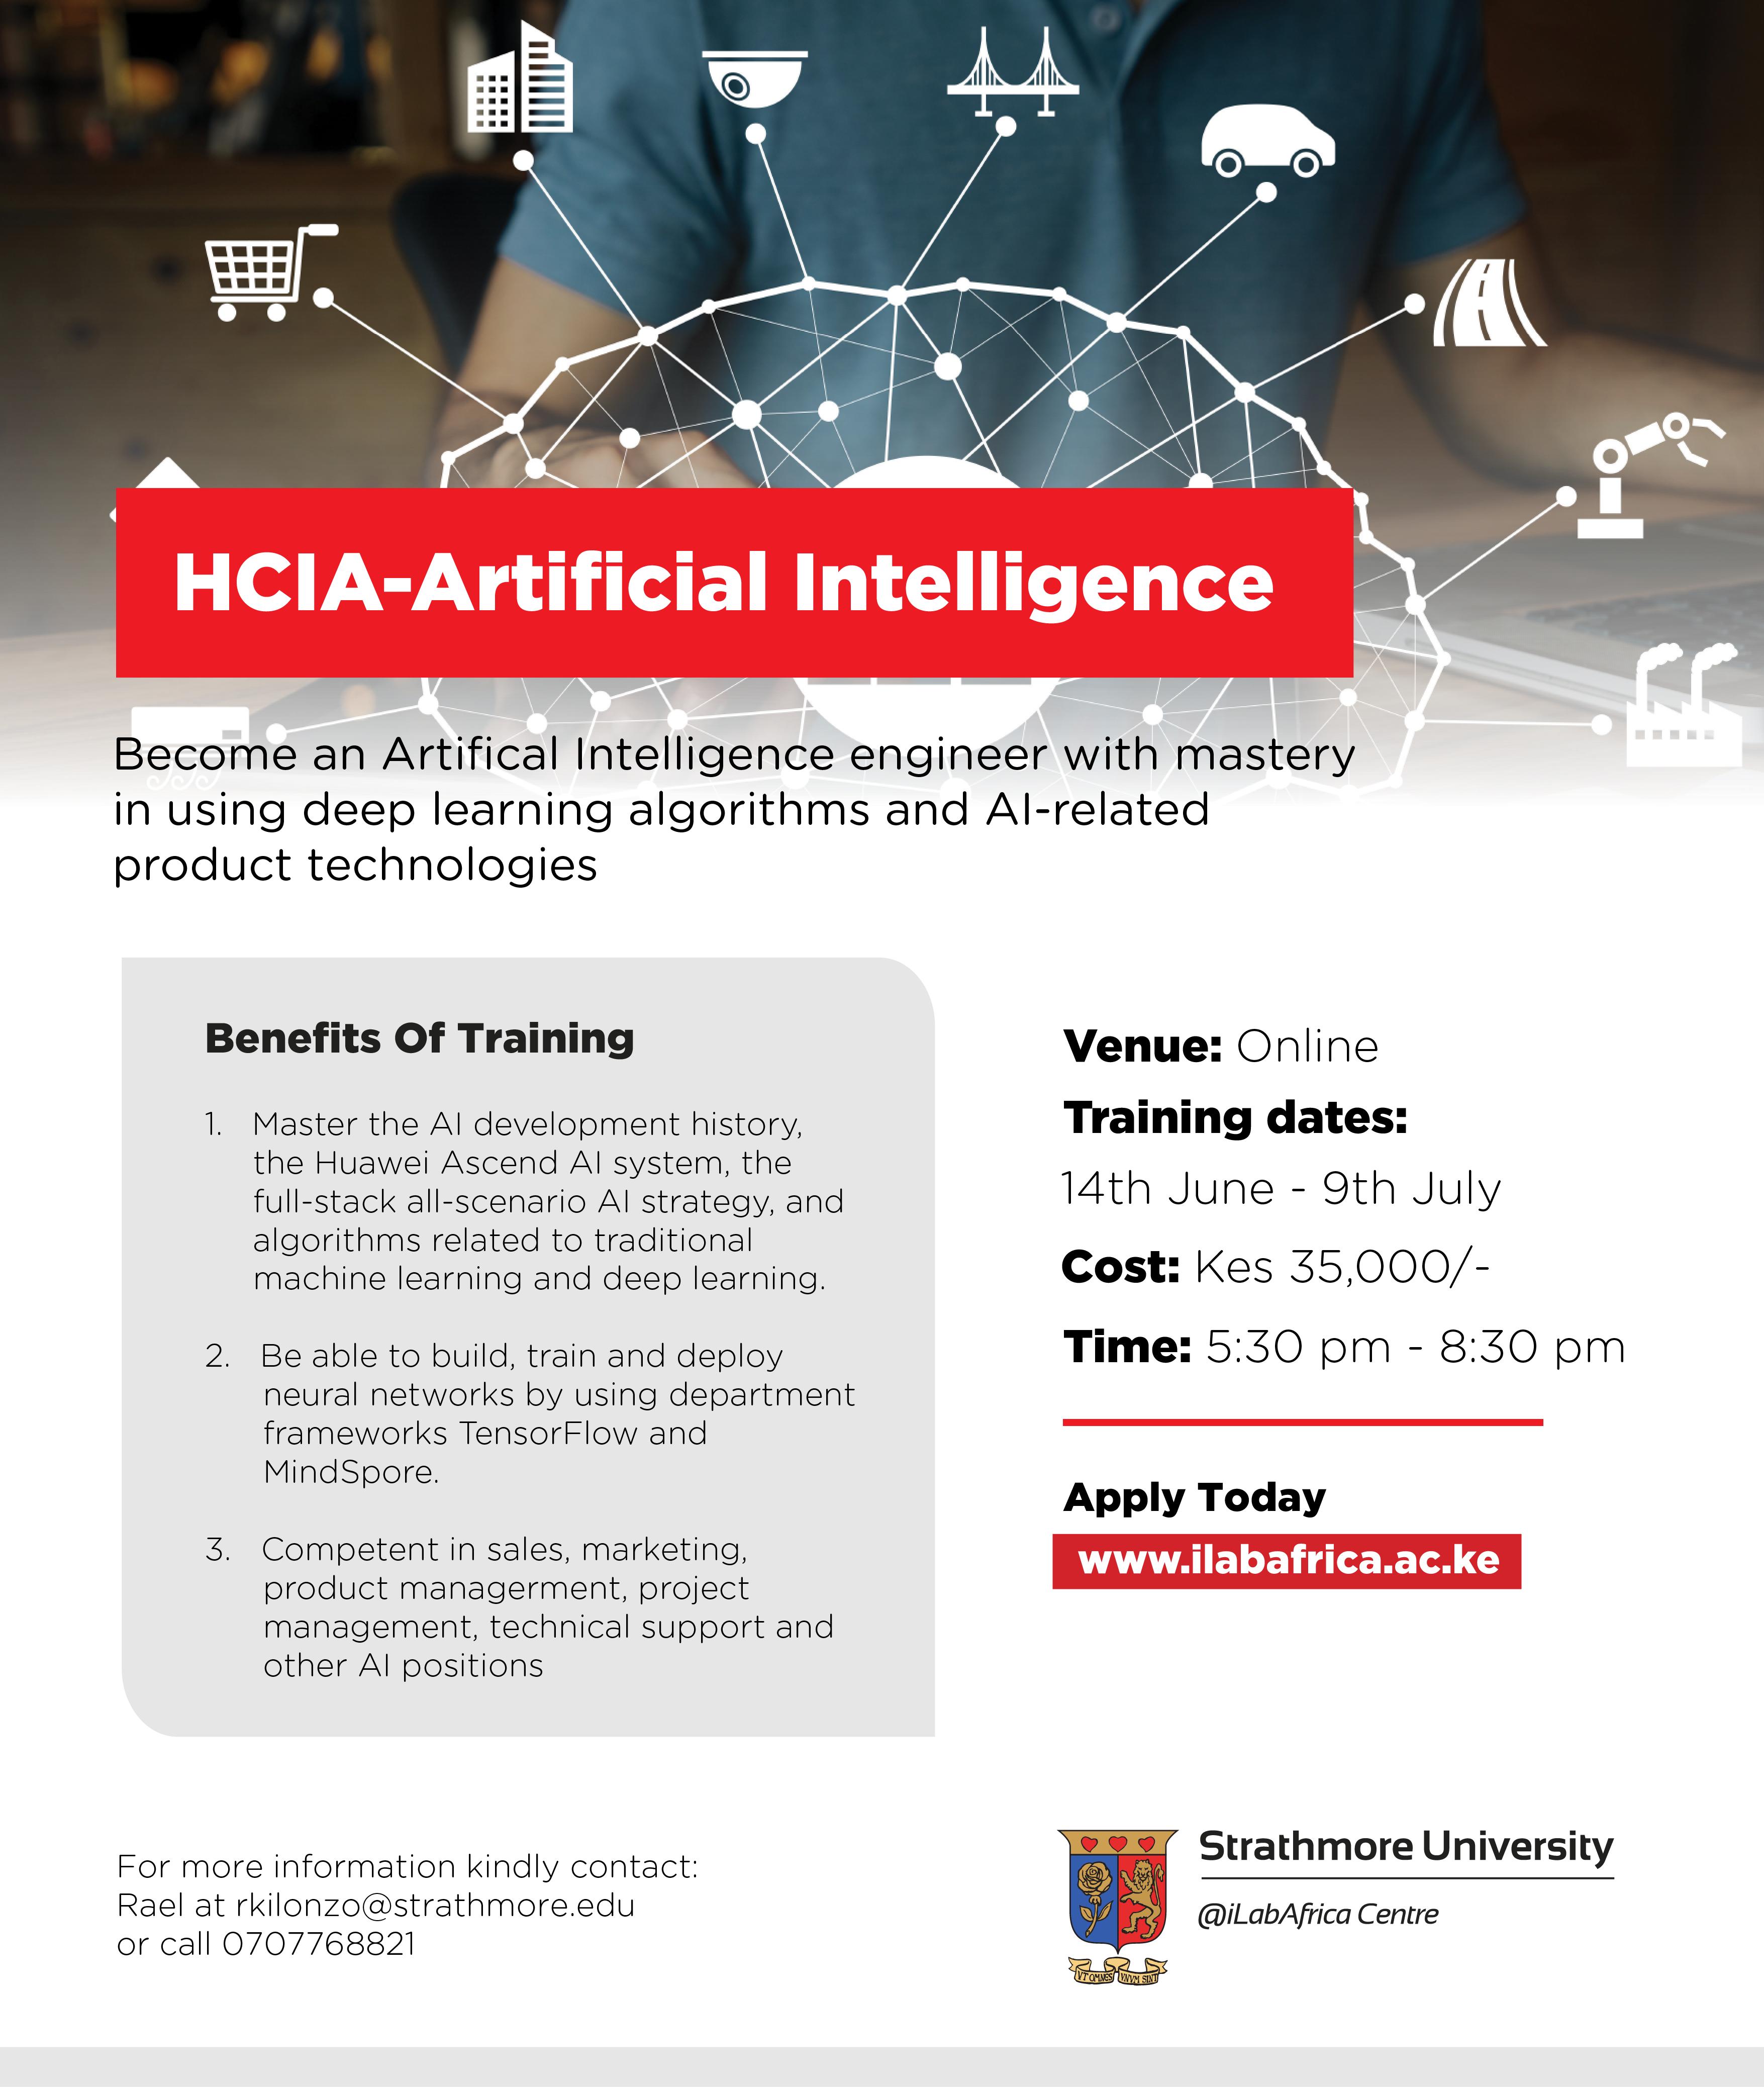 HCIA-Artificial Intelligence-01